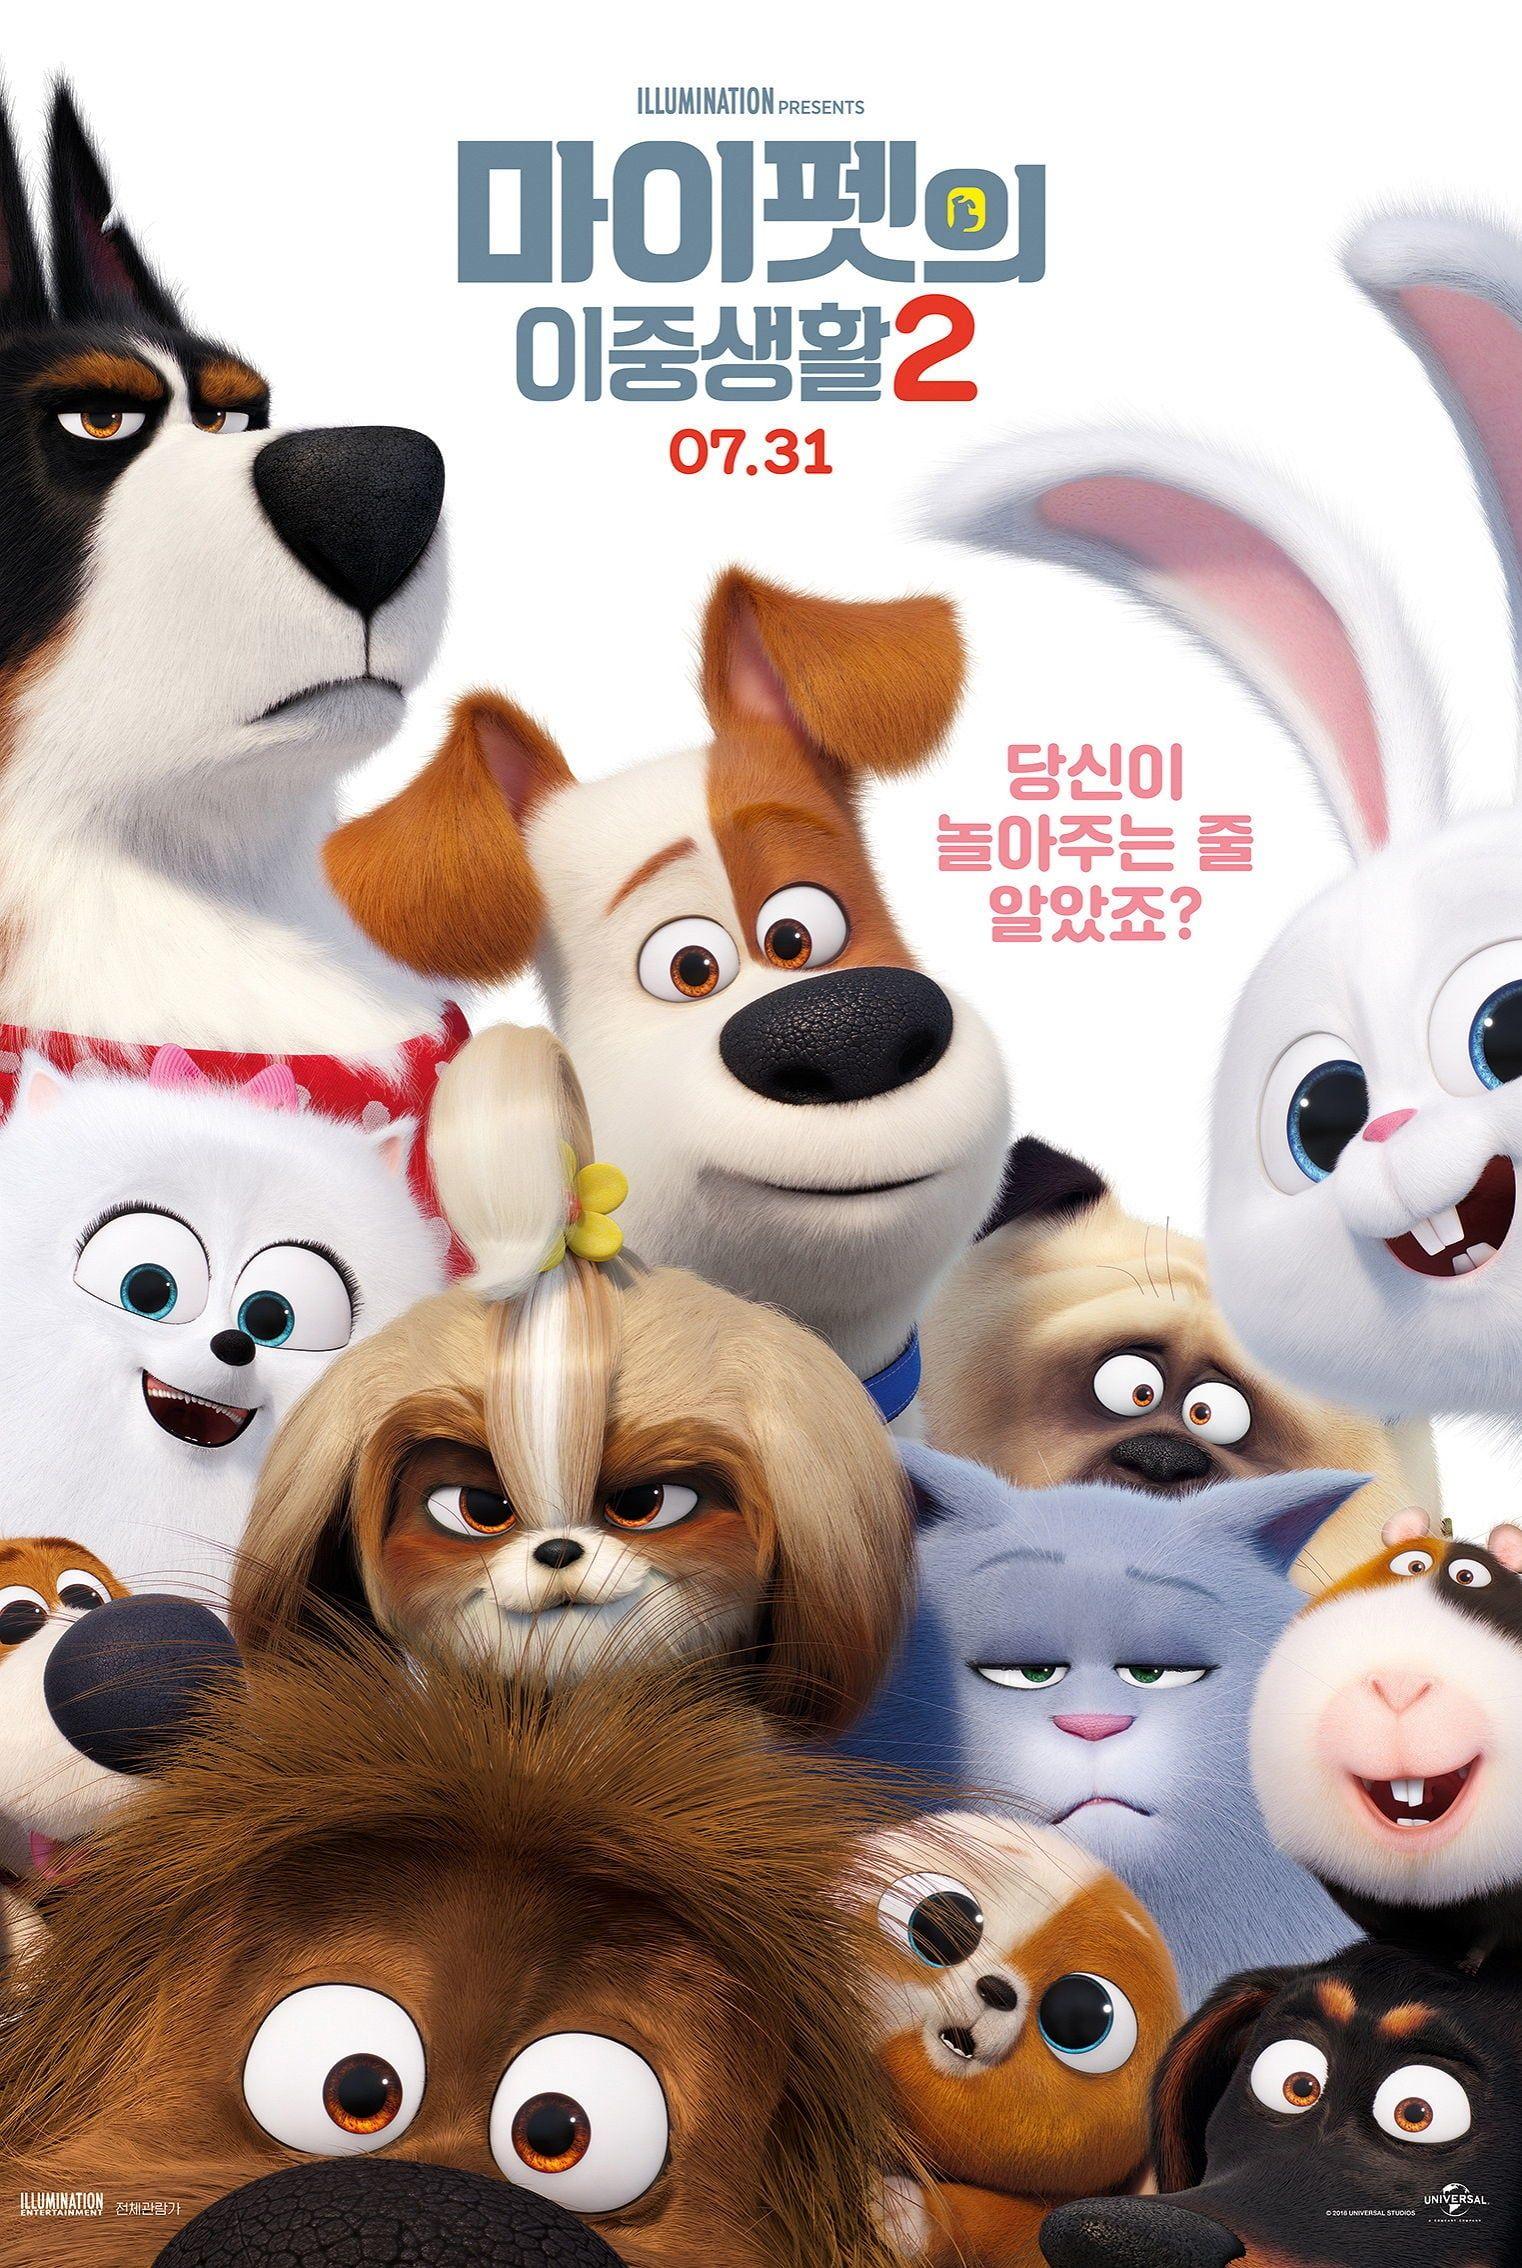 Full Movie English In Full Hd 1080p Thesecretlifeofpets2 Fullmovie Fullmovieonline Streamingonline Pinterestmovie Lukisan Disney Kartun Kartun Disney The secret life of pets 2